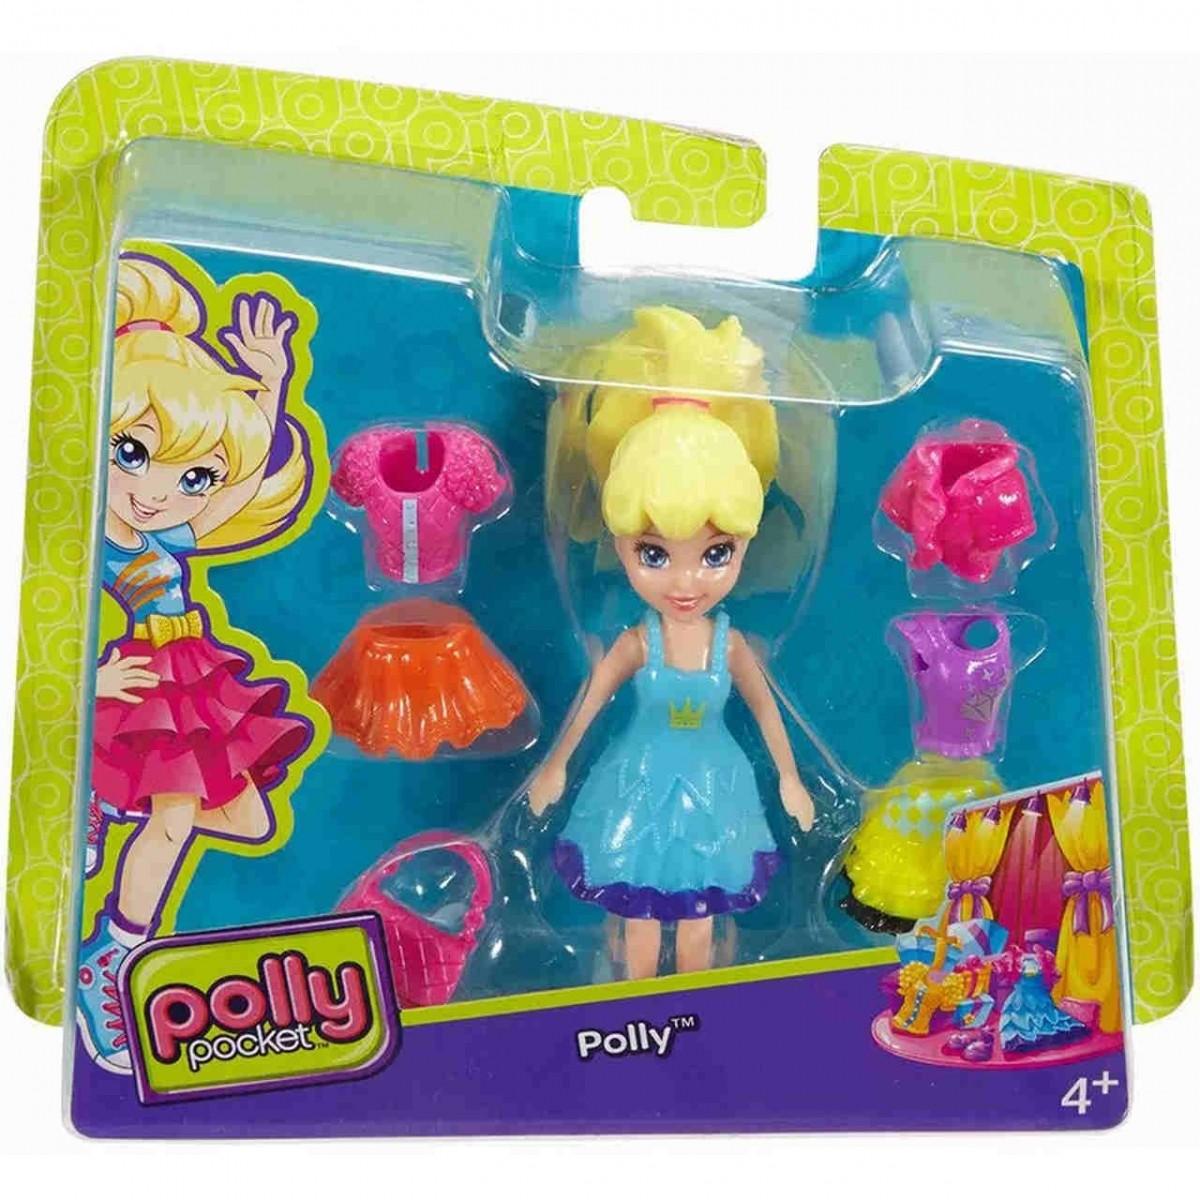 Boneca Polly com Vestido Azul: Polly Pocket